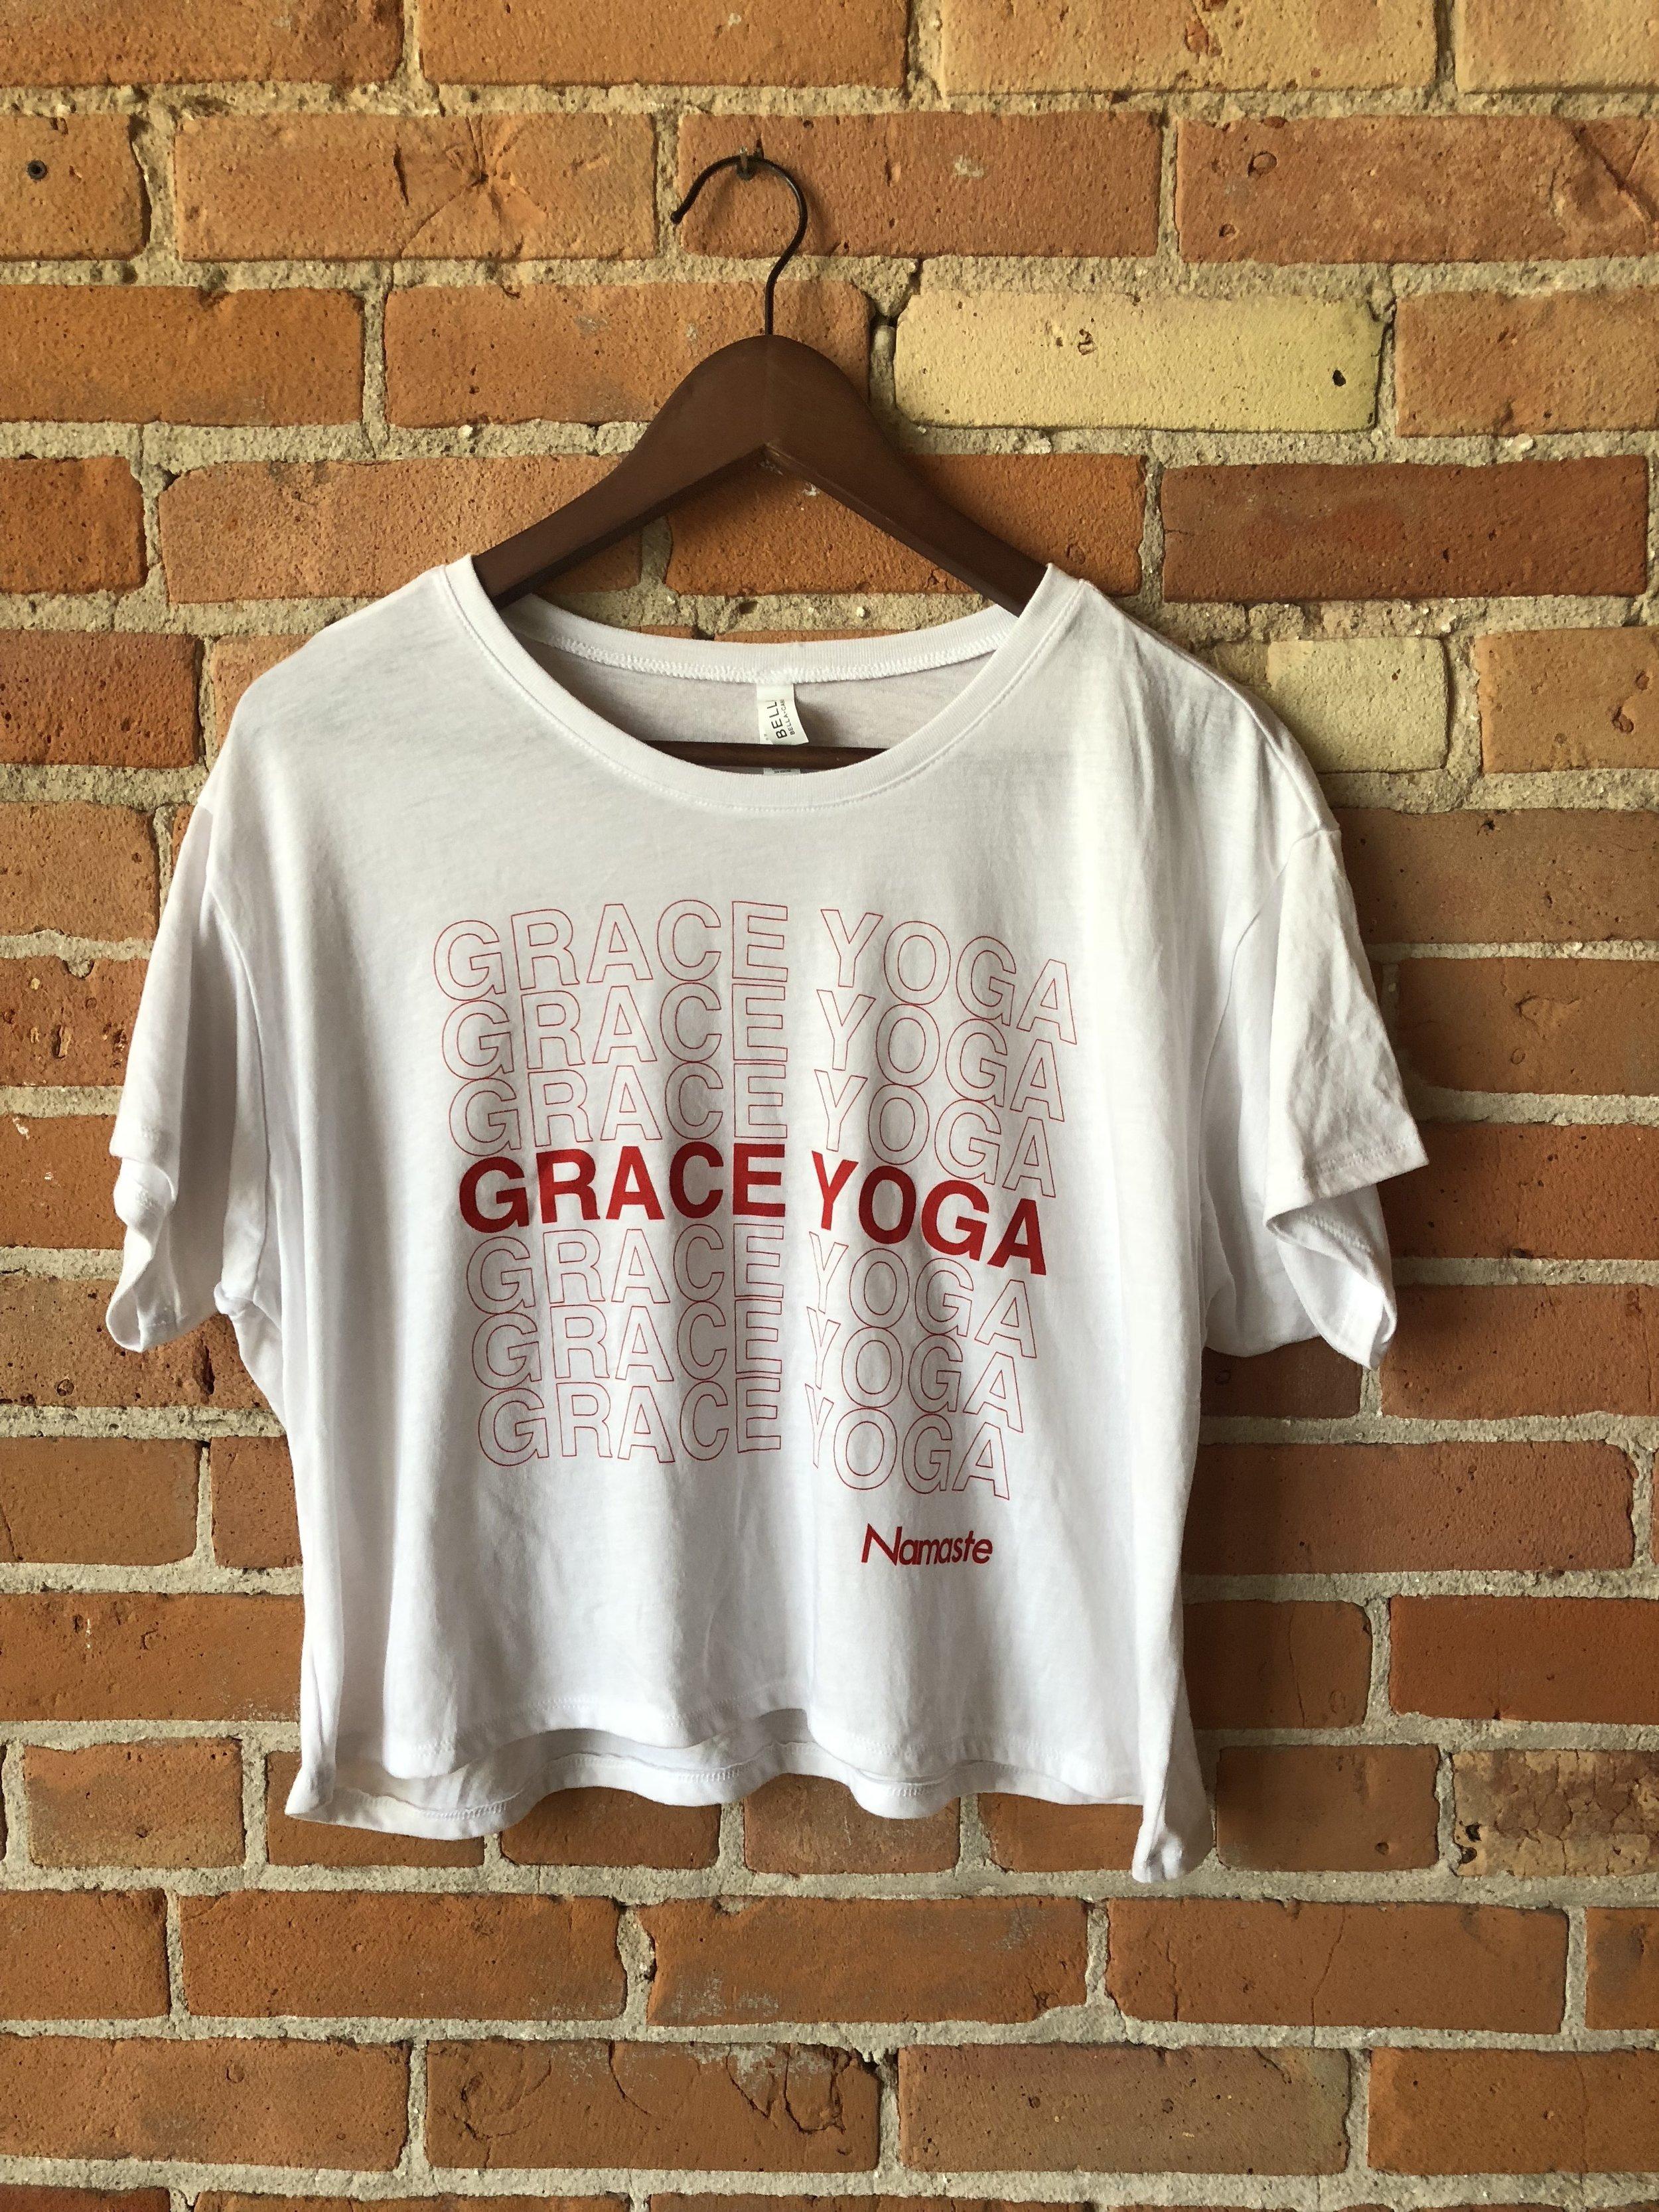 - Grace Yoga Plastic Bag T-Shirt$18